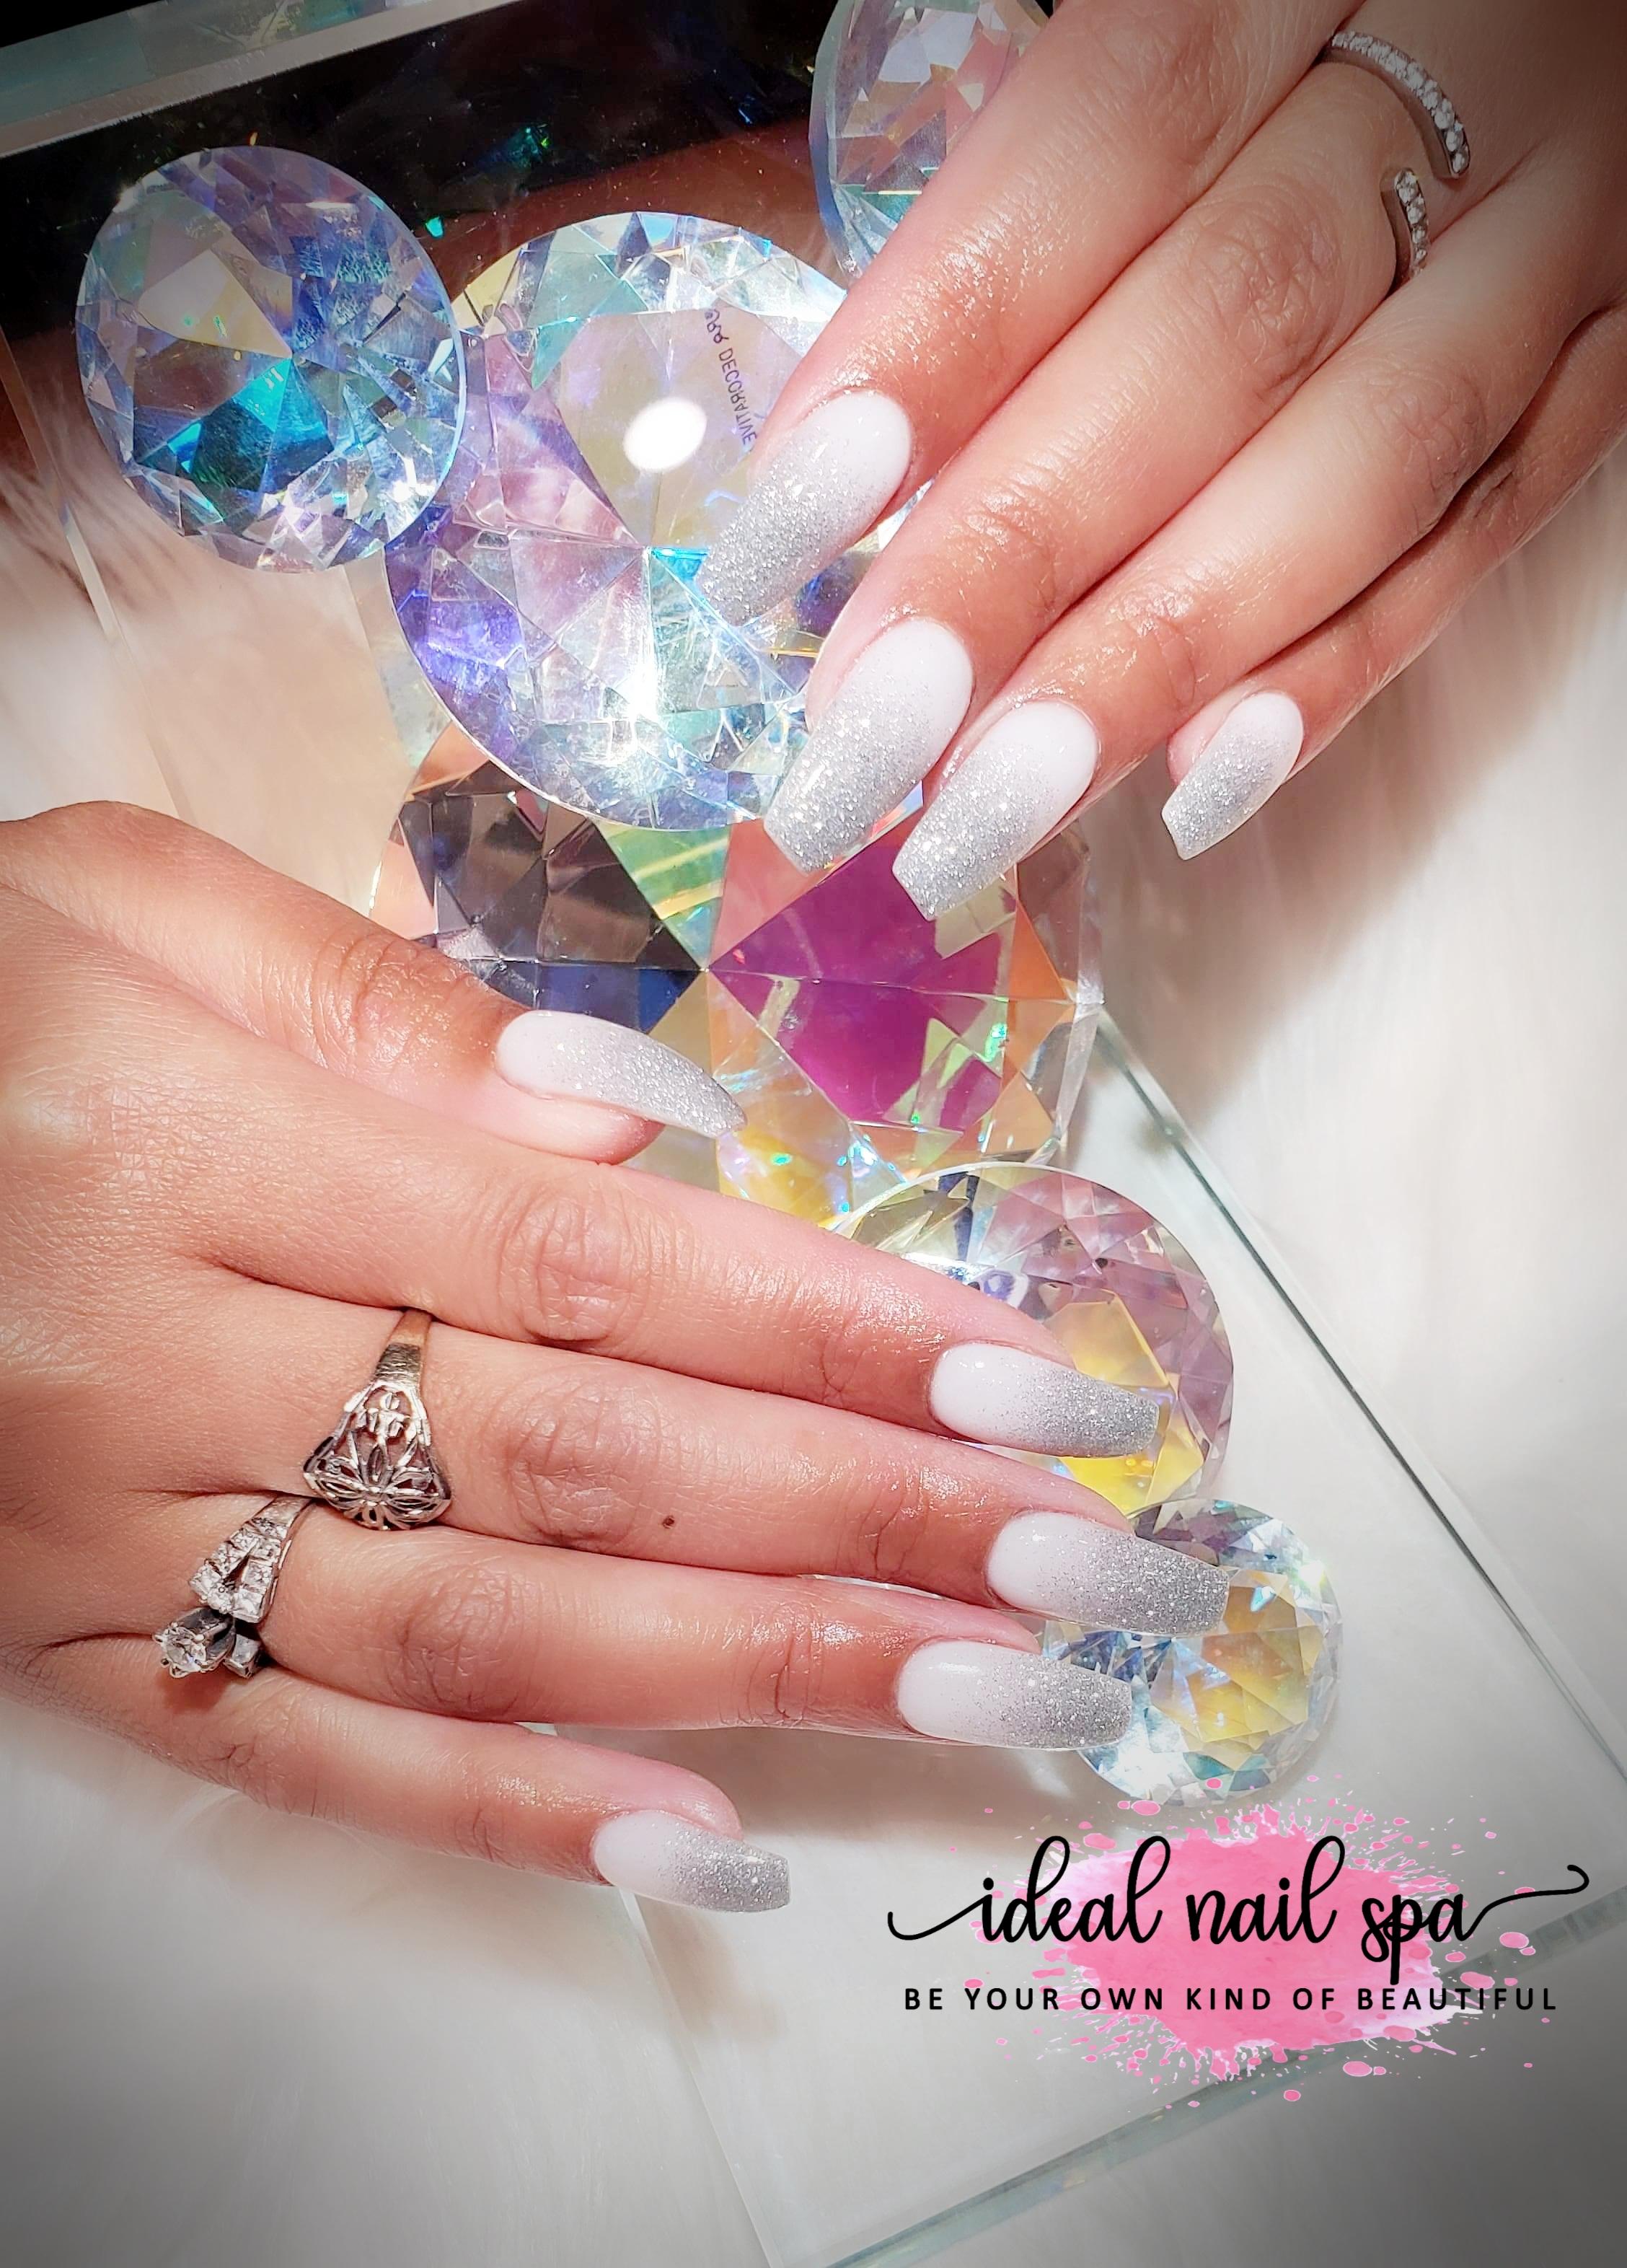 BeautyPlus_20200301083116564_save